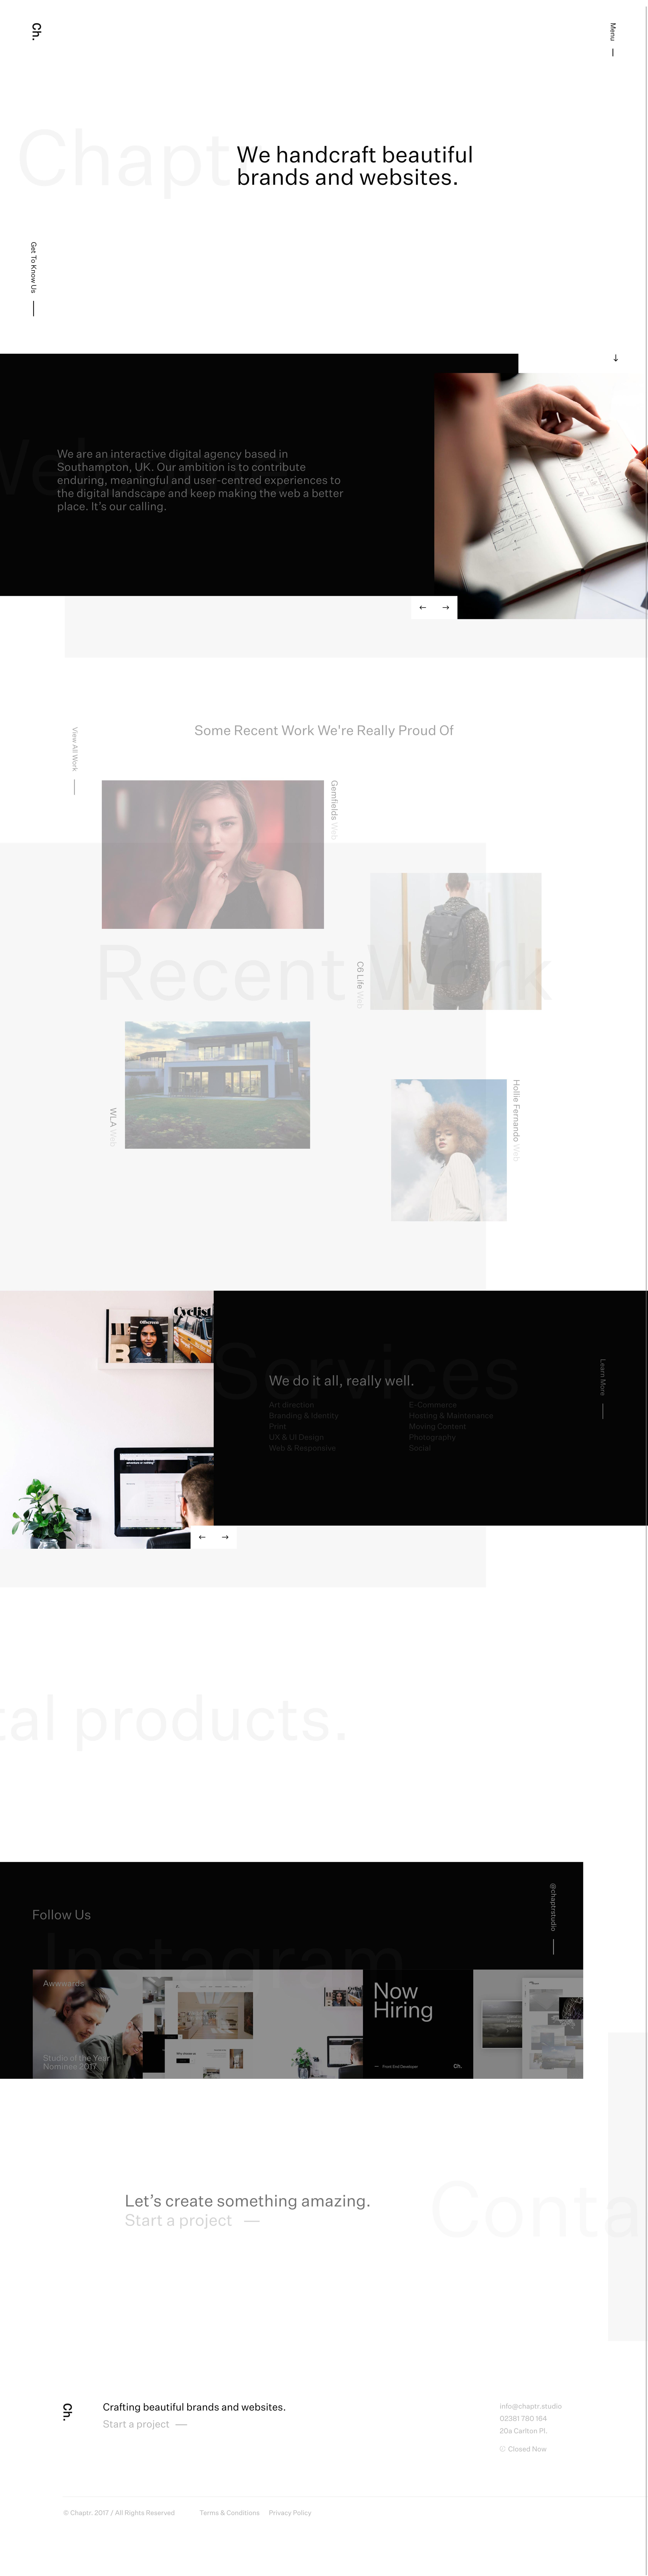 Pin By Landing Flow On Impactful Landing Page Design Inspiration 2020 Web Design Creative Agency Web Design Agency